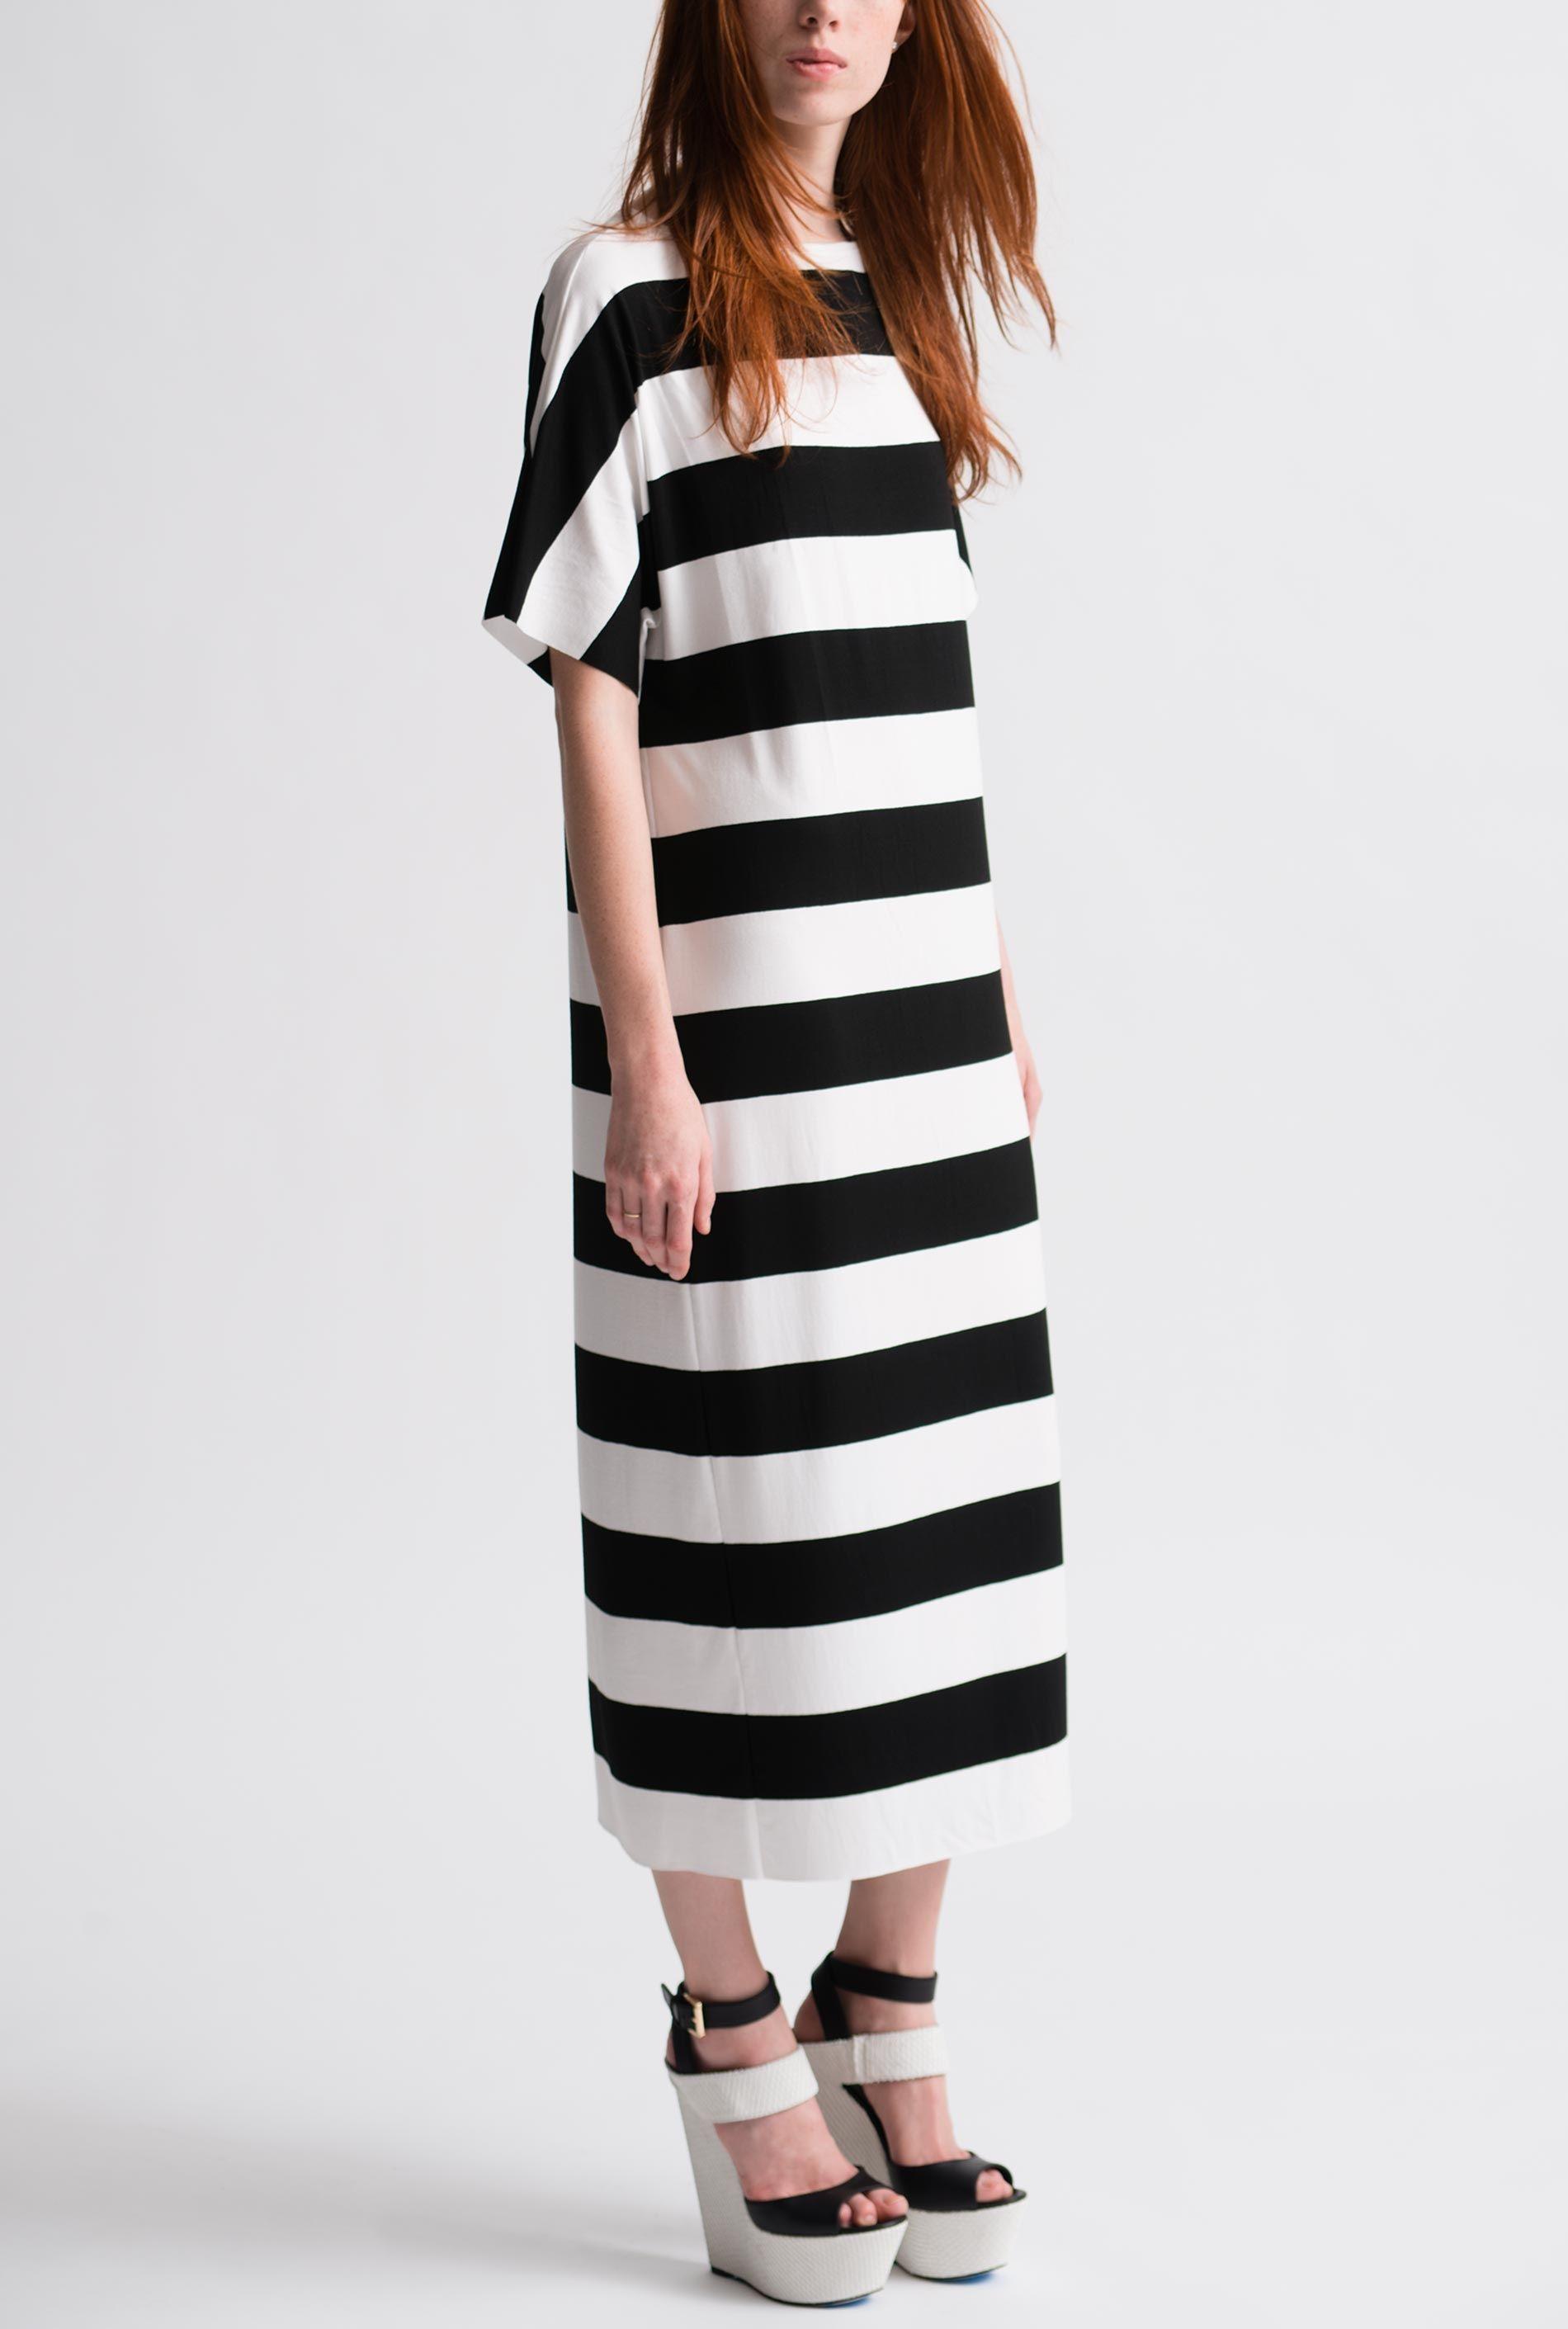 Black and White Mod Stripe Sheath Dress   Nadia Tarr